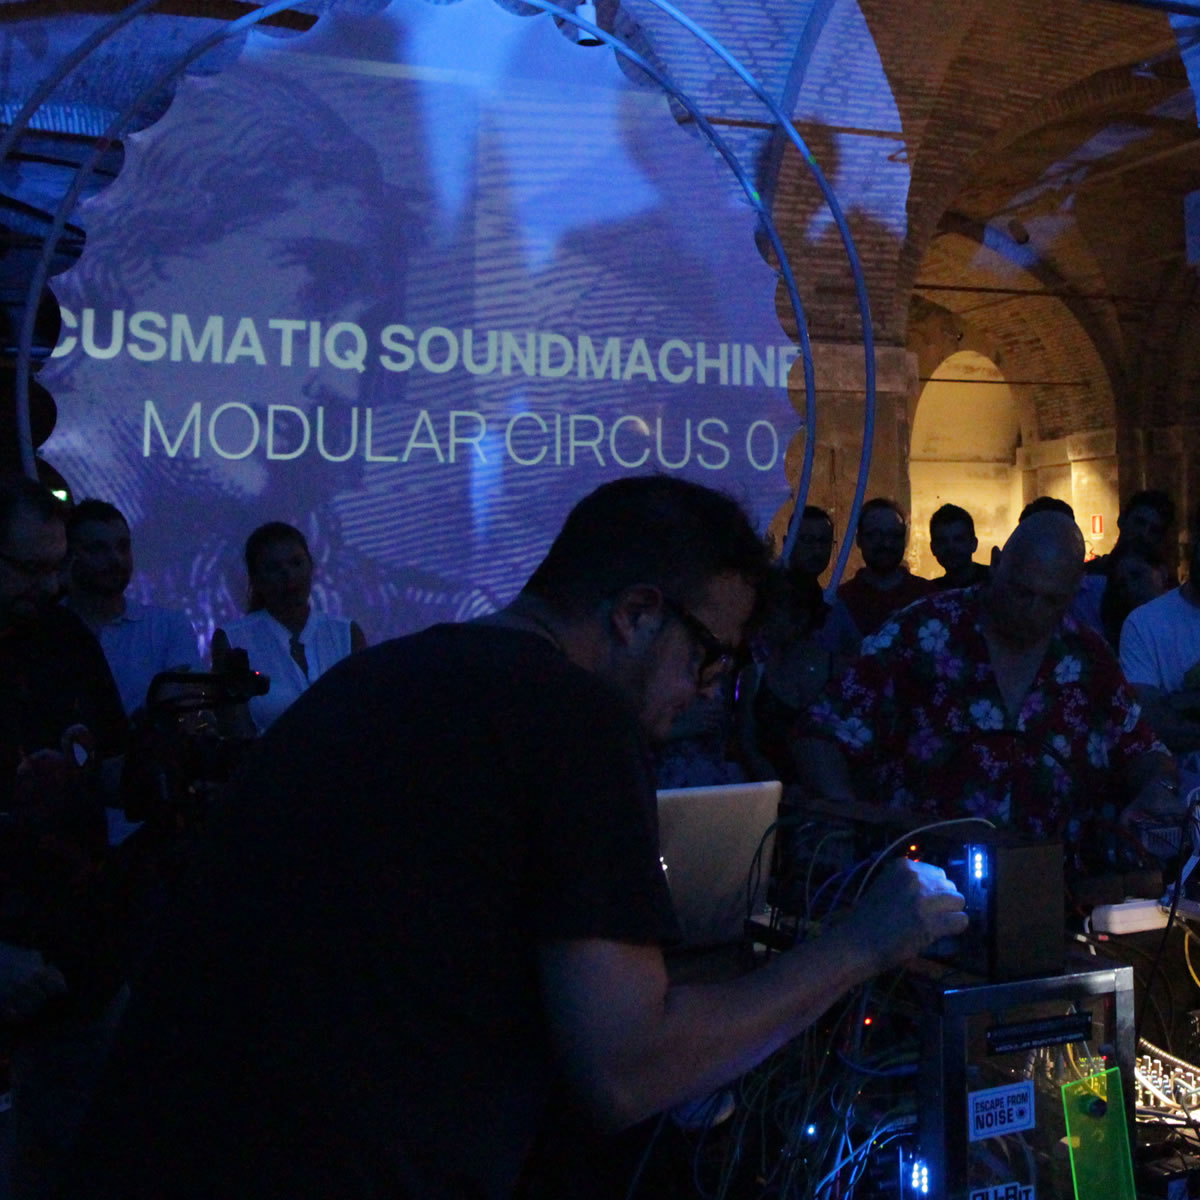 ASMOC 05 – Acusmatiq Soundmachines Modular Circus